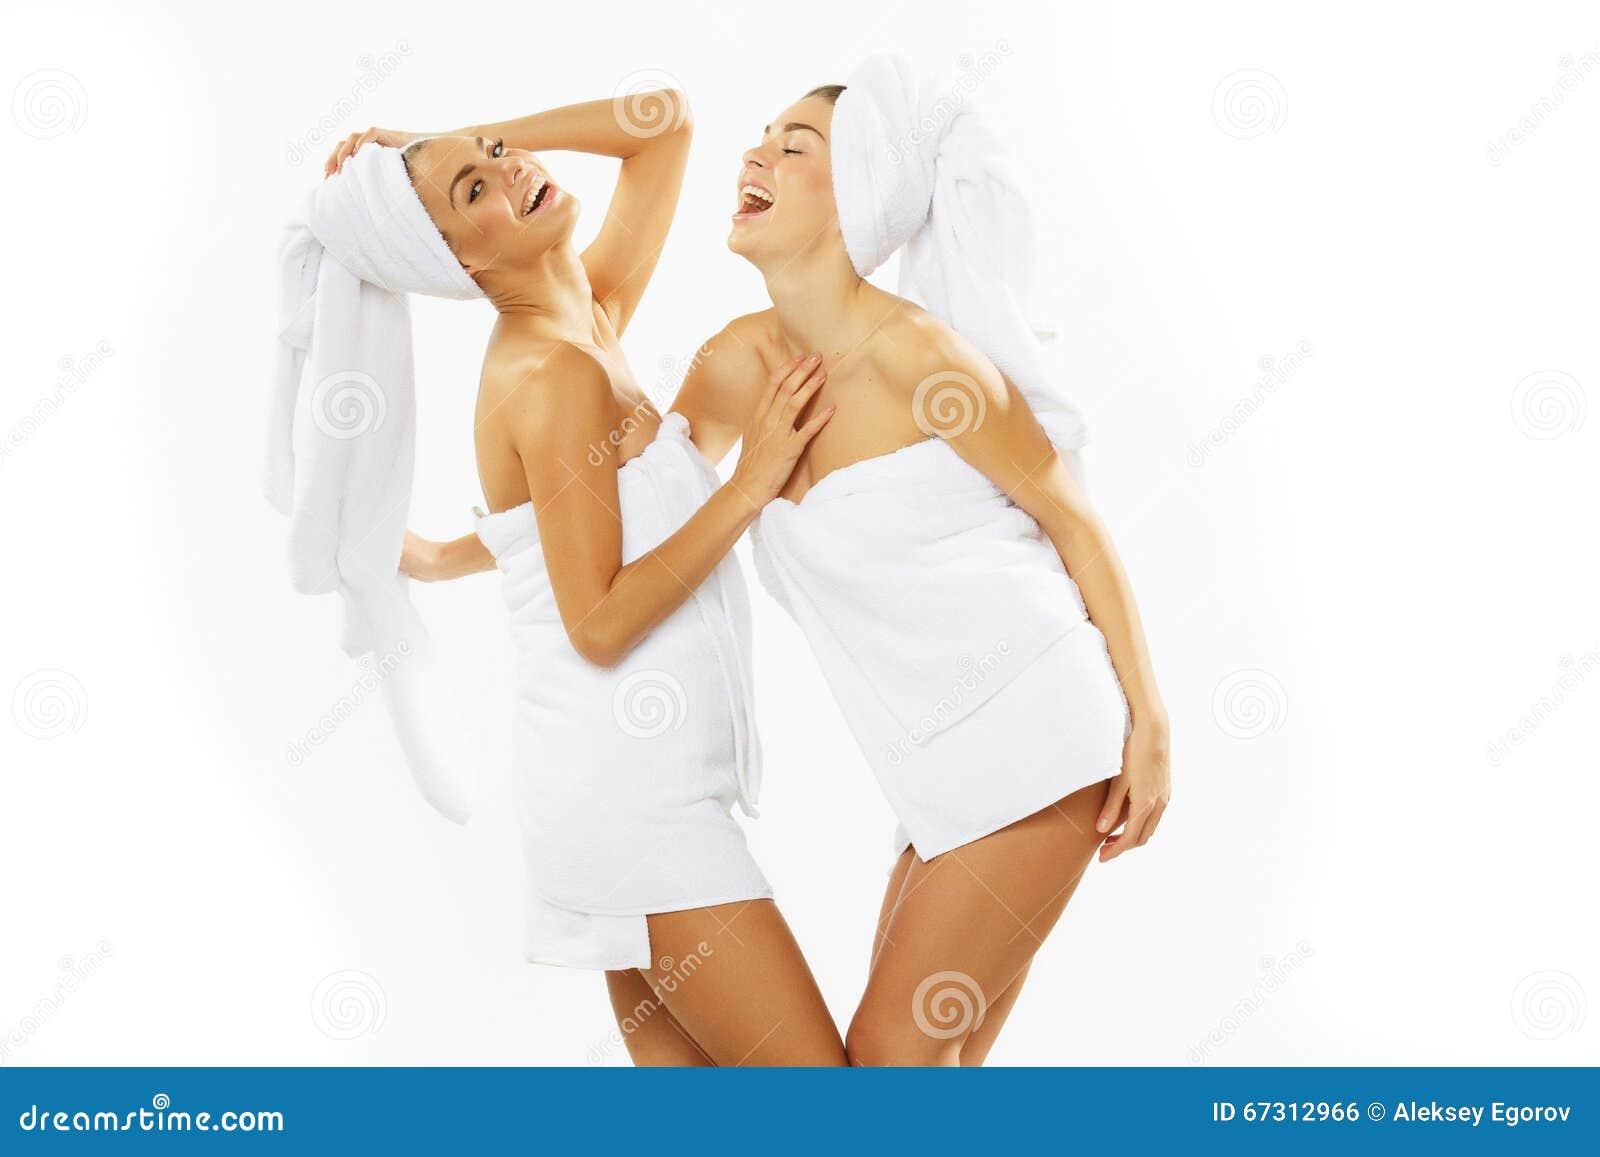 Mallika sherawat naked models